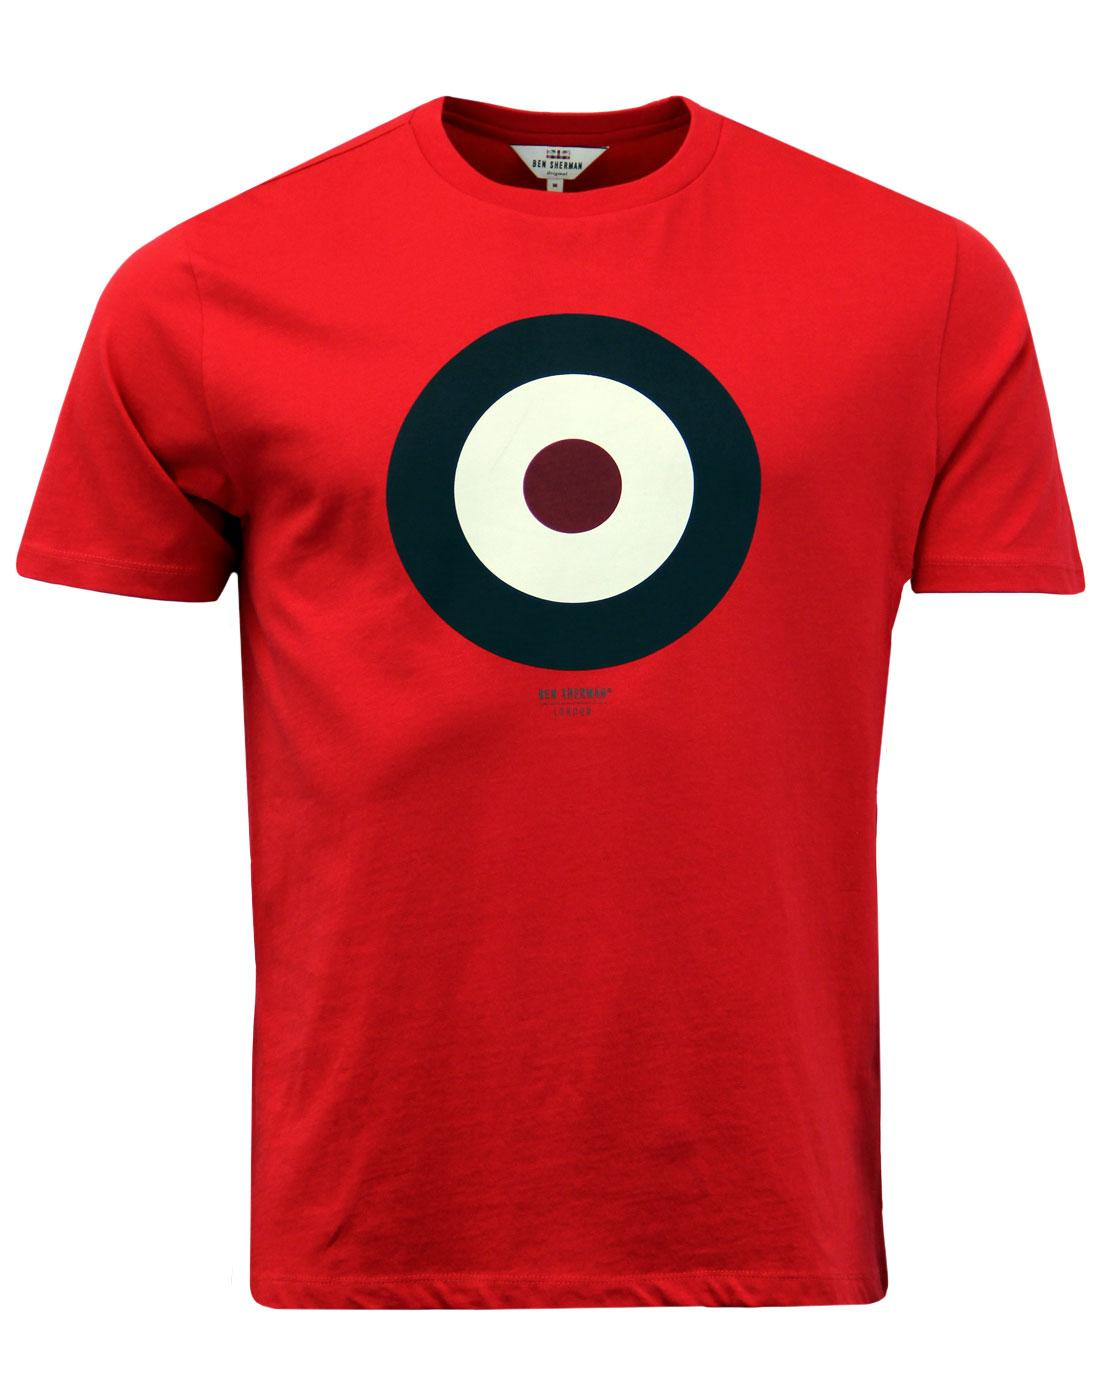 BEN SHERMAN Keith Moon 60s Mod Target T-Shirt (DR)